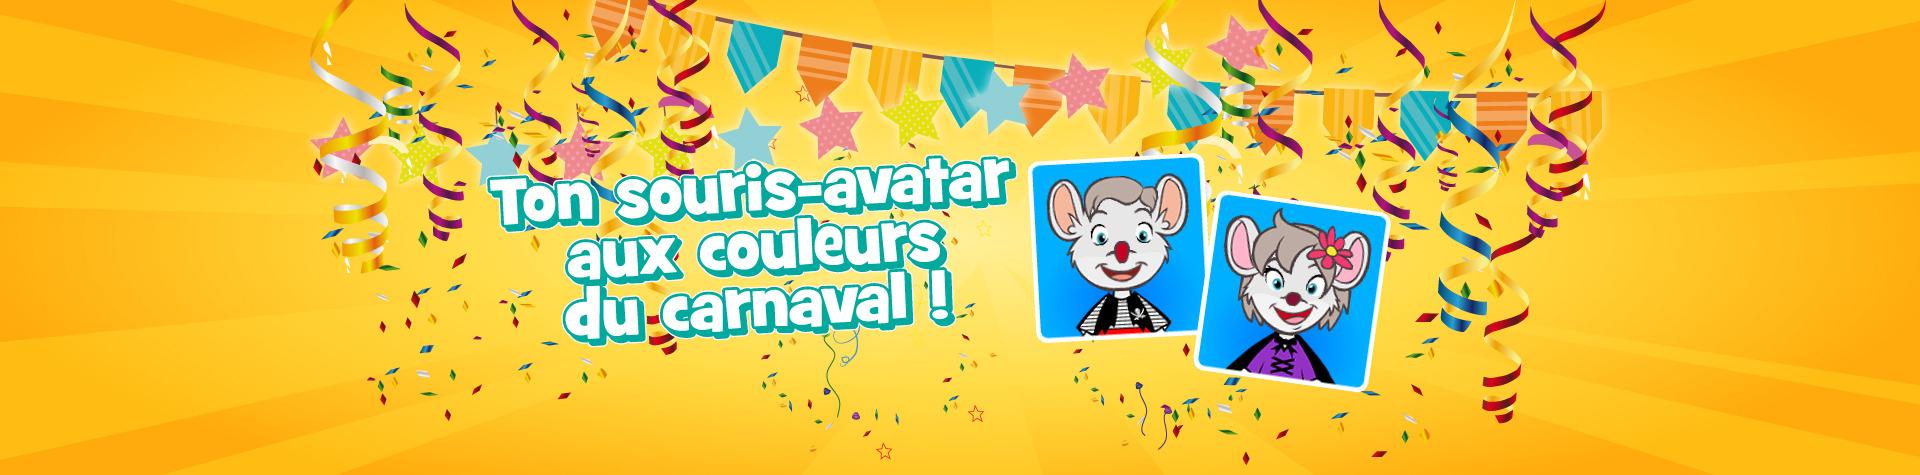 souris-avatar carnaval